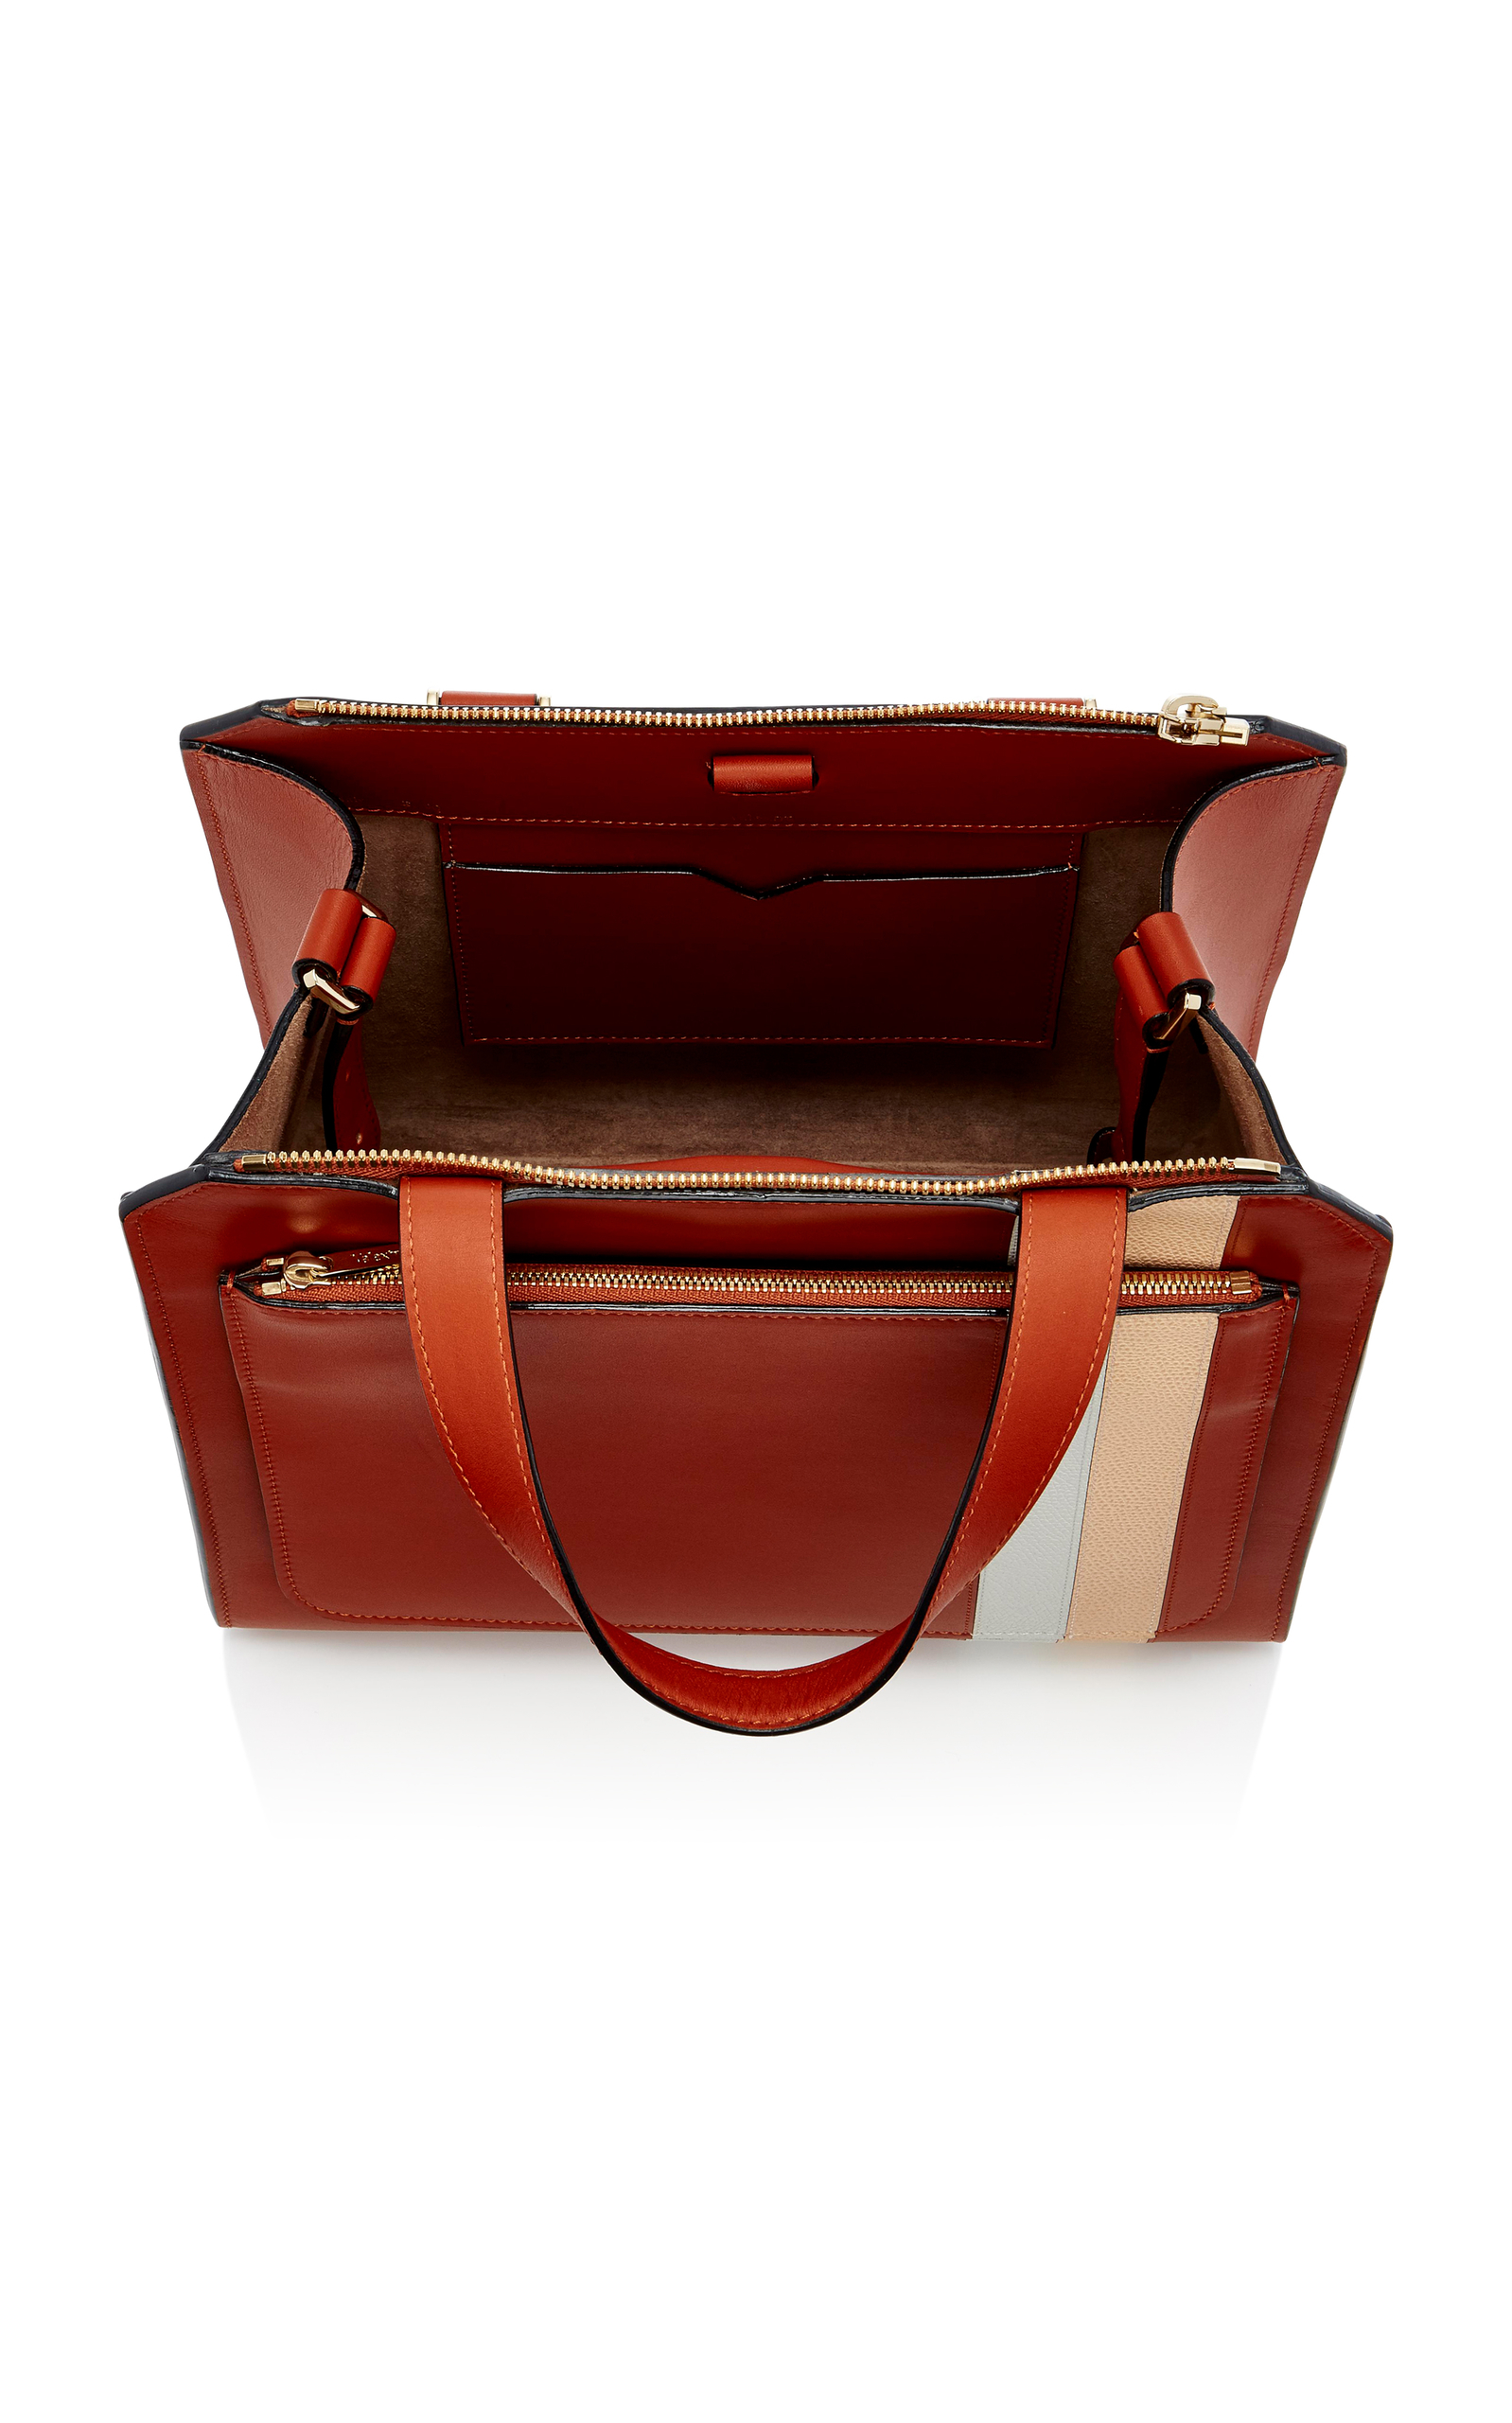 Valextra Linea Toothpaste Passepartout Leather Bag QFtFKMc